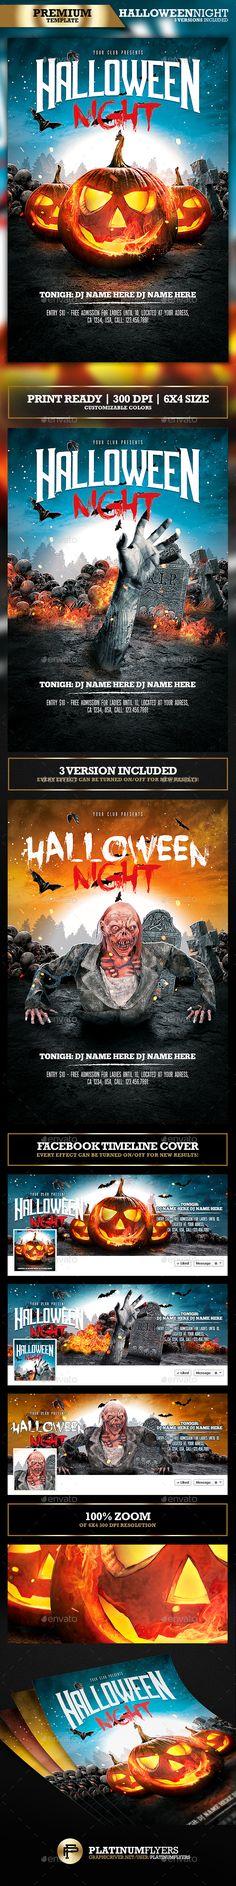 Halloween Party Flyer / Halloween Night - Clubs & Parties Events